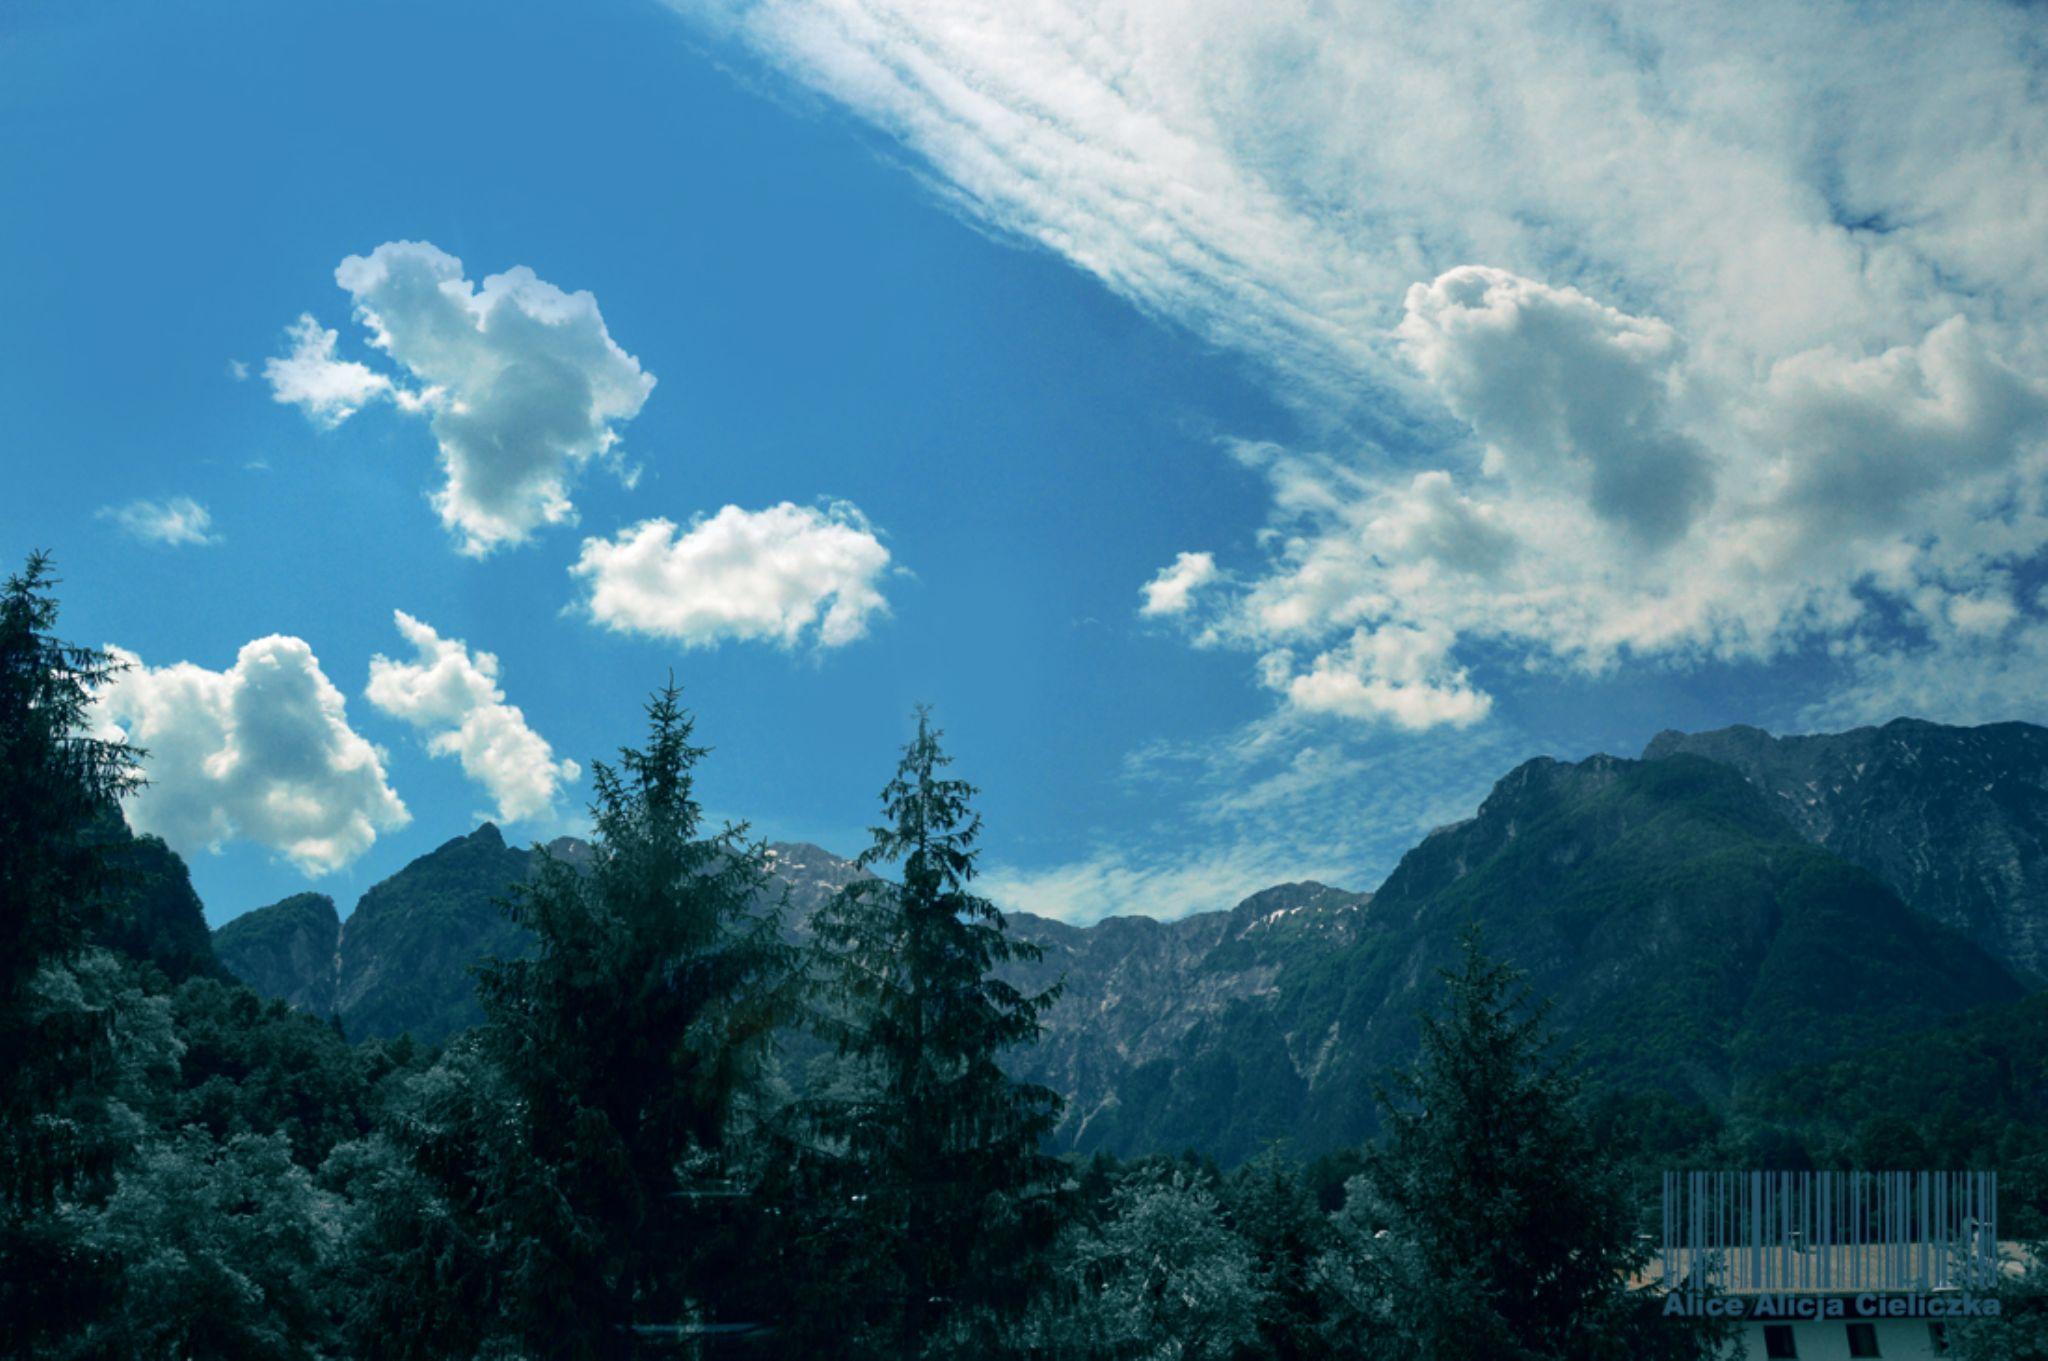 sky_8 by alice240